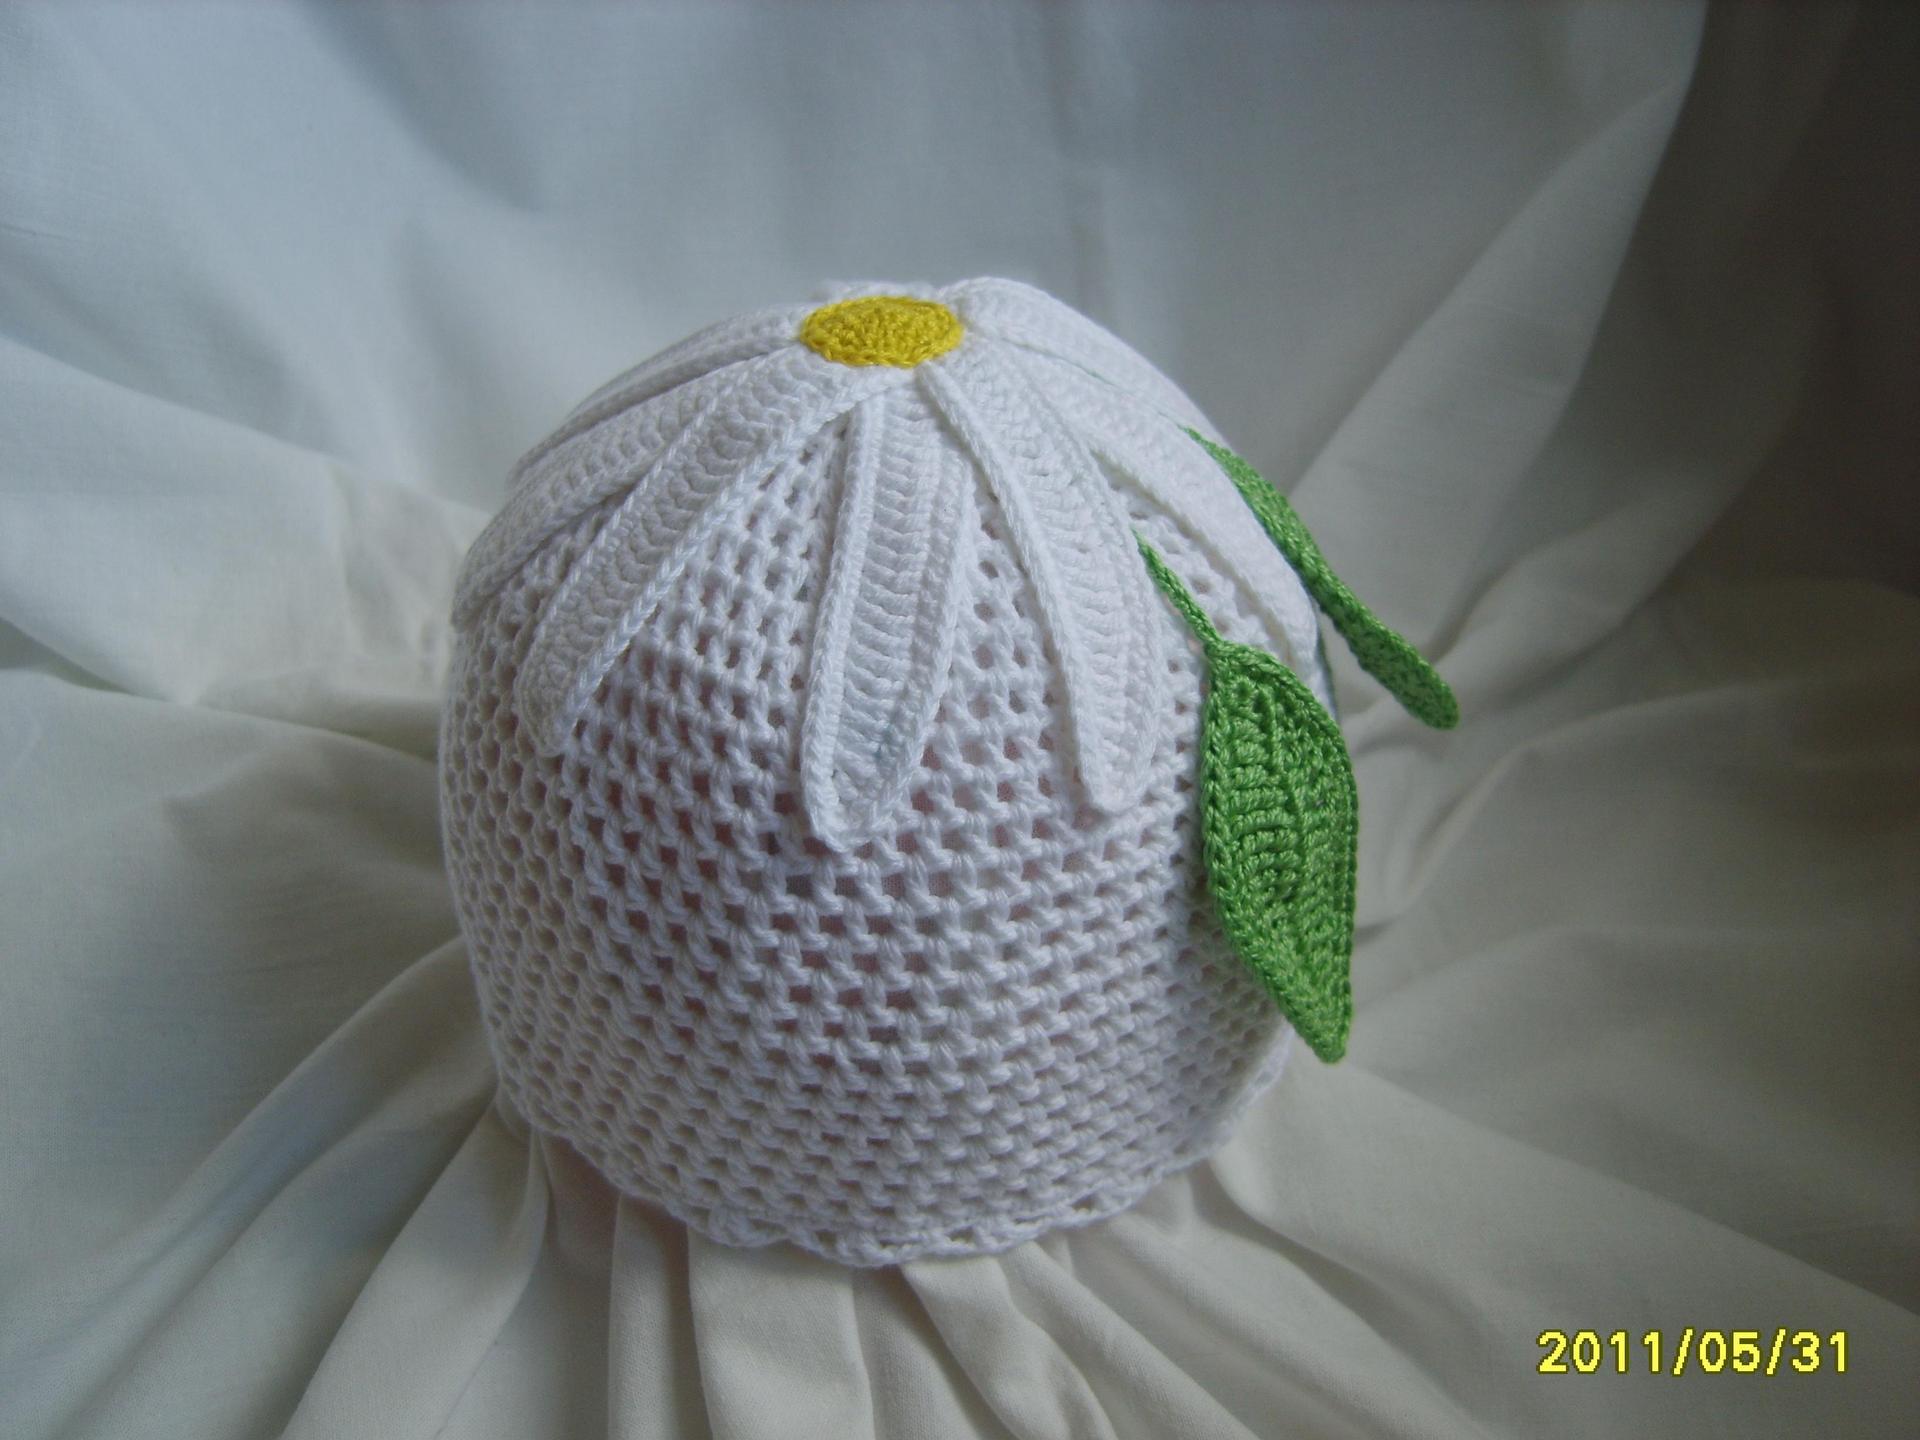 Вязание крючком ромашка на шапке